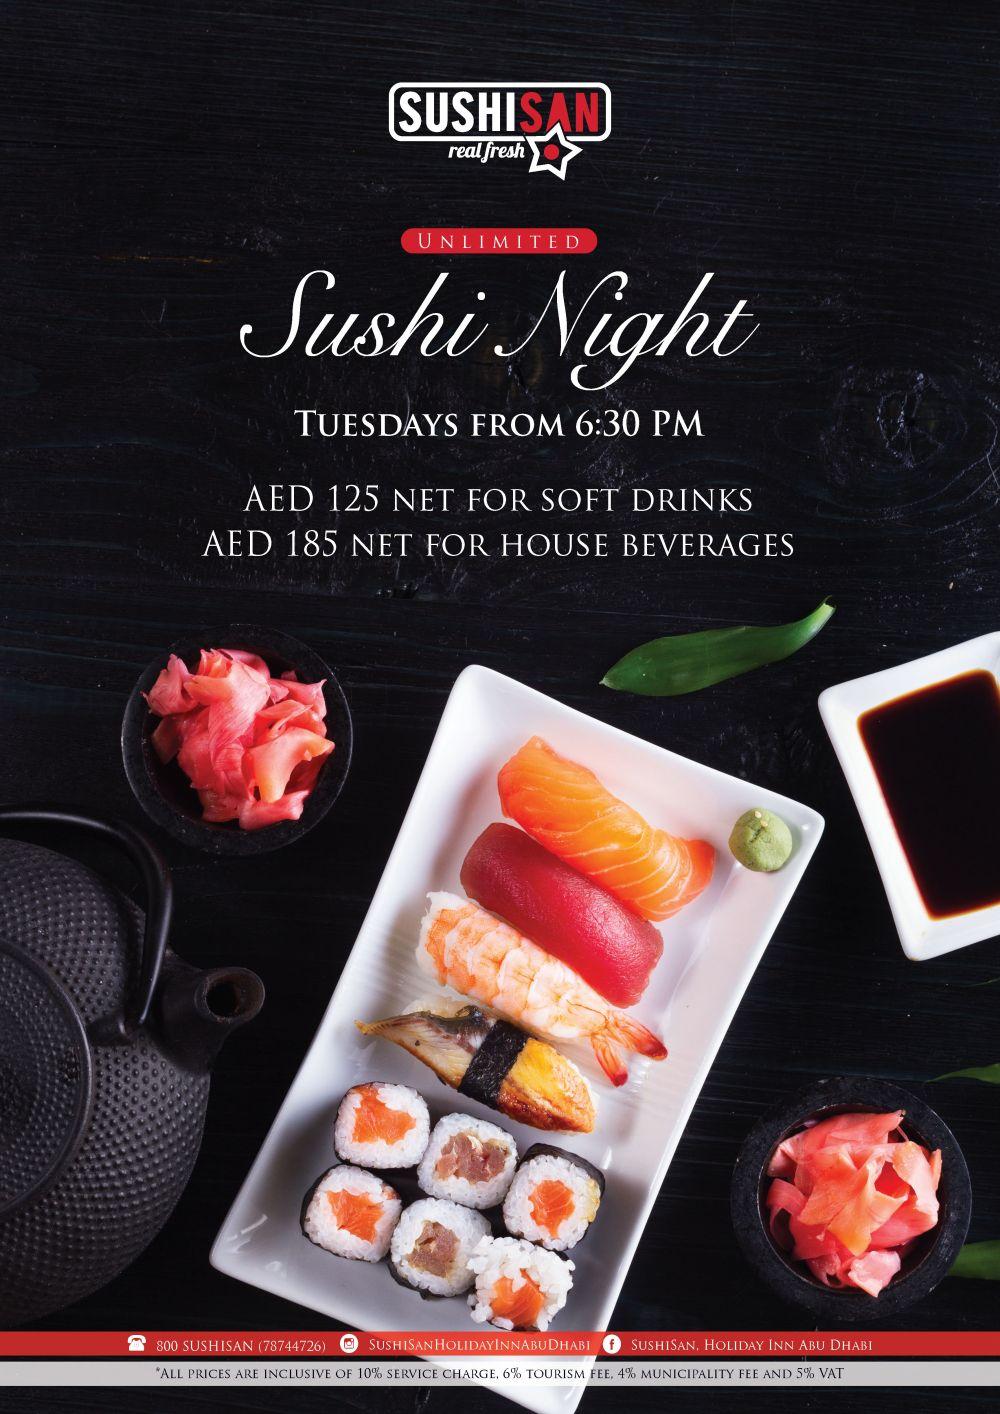 Sushi Night - A4